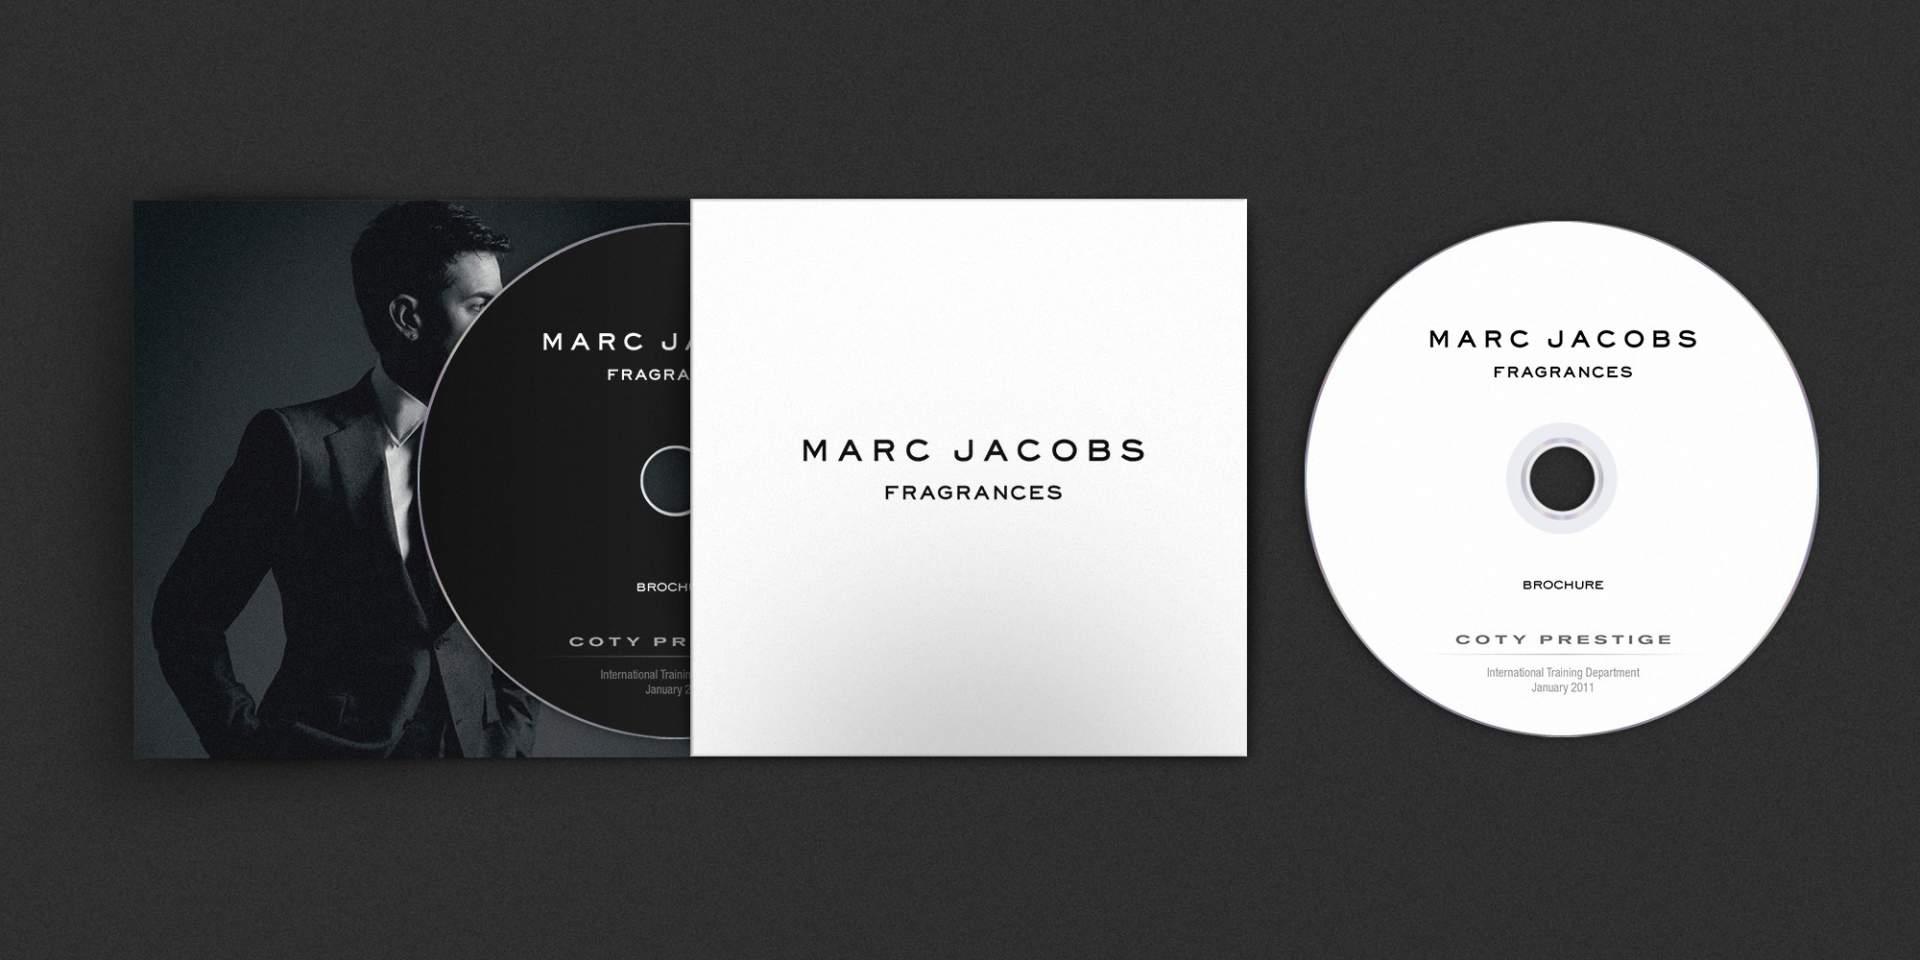 01-DA2 AGENCY - Marc Jacobs 07